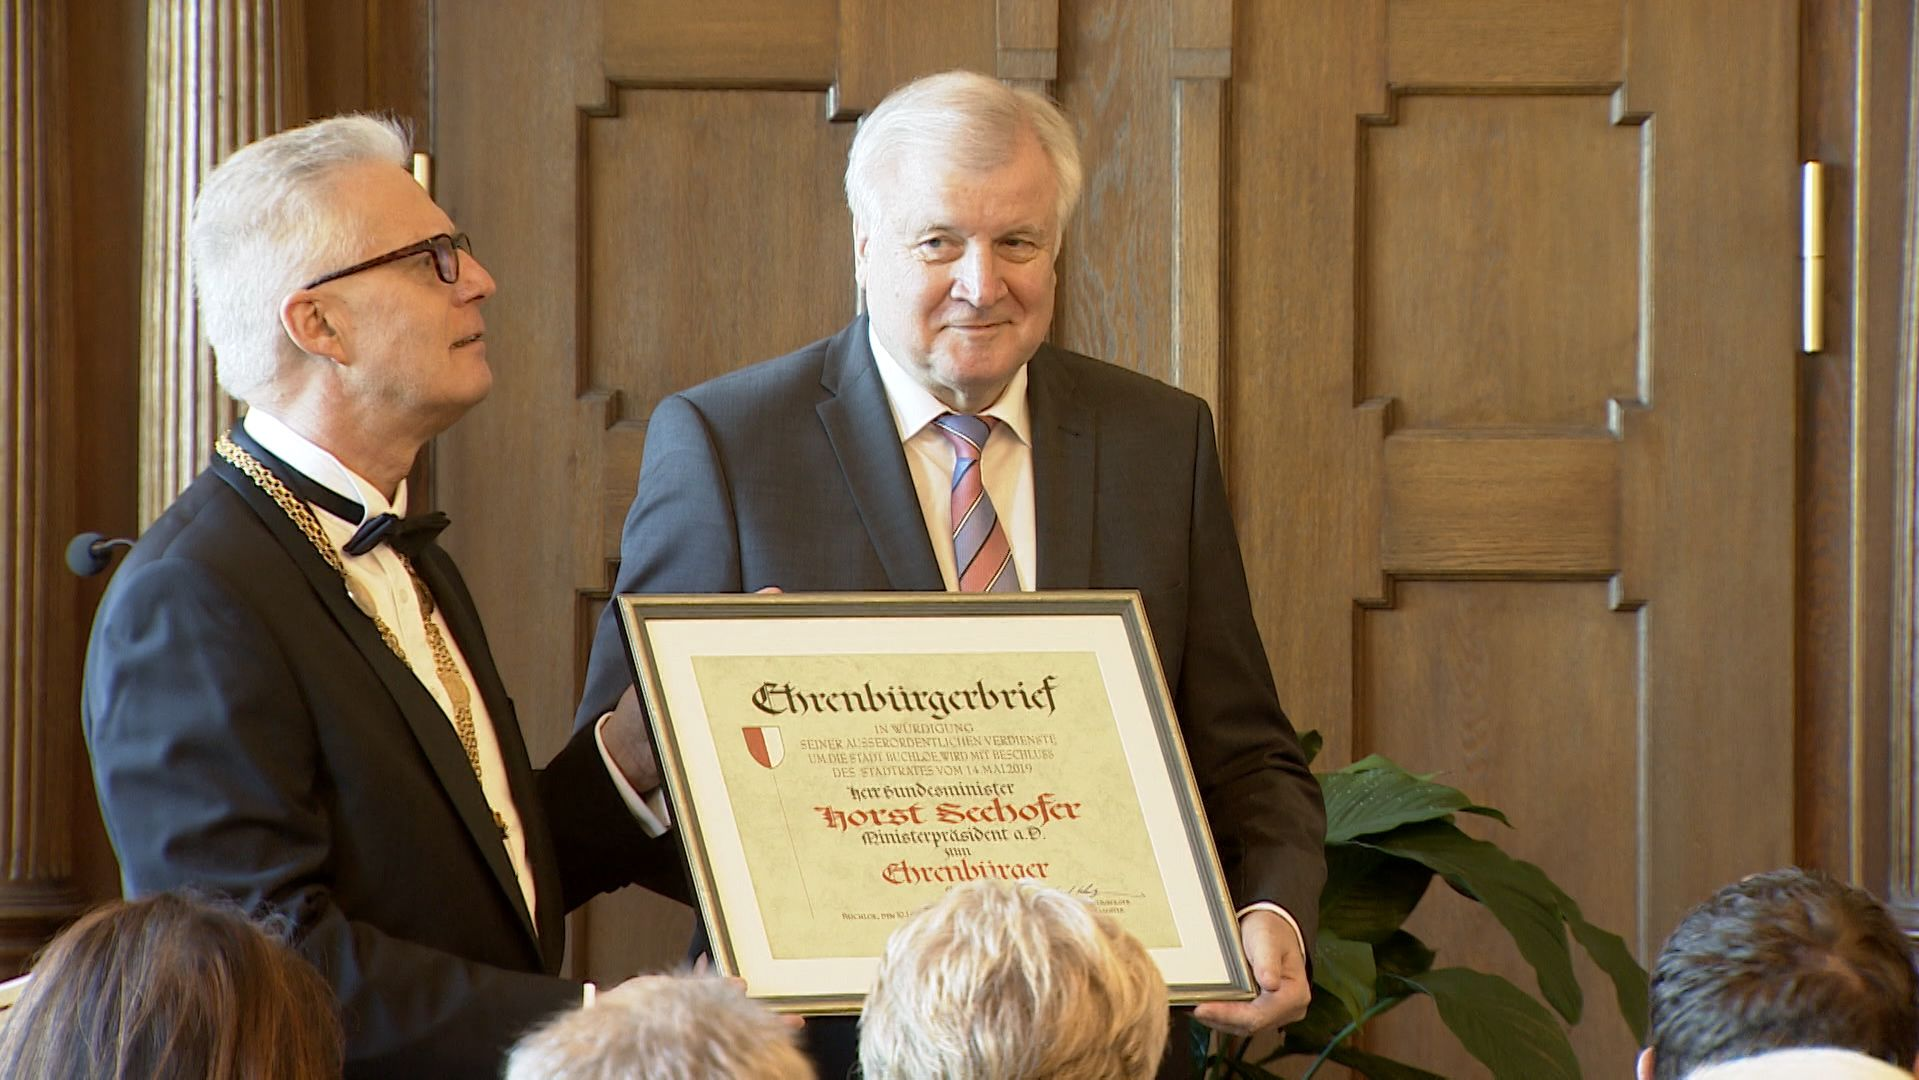 Horst Seehofer (rechts) ist jetzt Ehrenbürger der Stadt Buchloe.